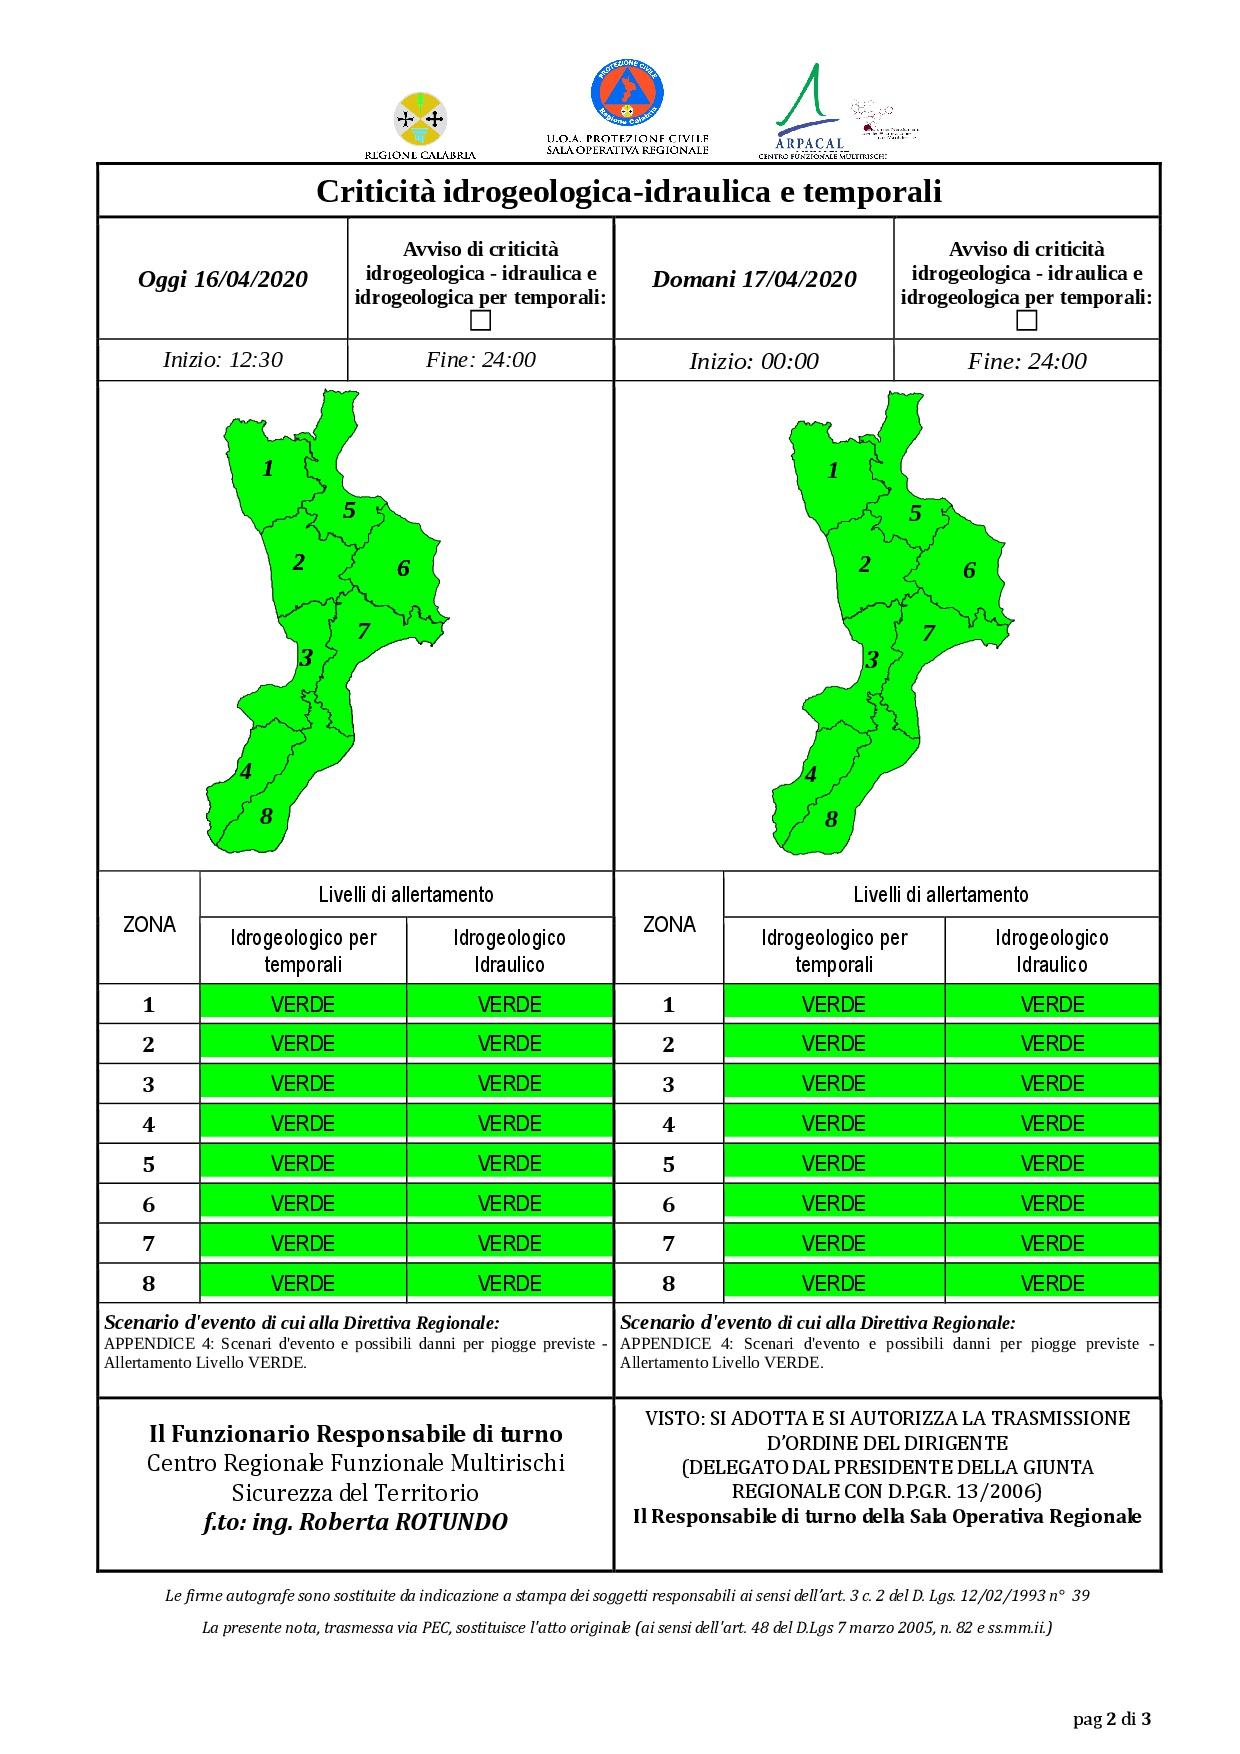 Criticità idrogeologica-idraulica e temporali in Calabria 16-04-2020